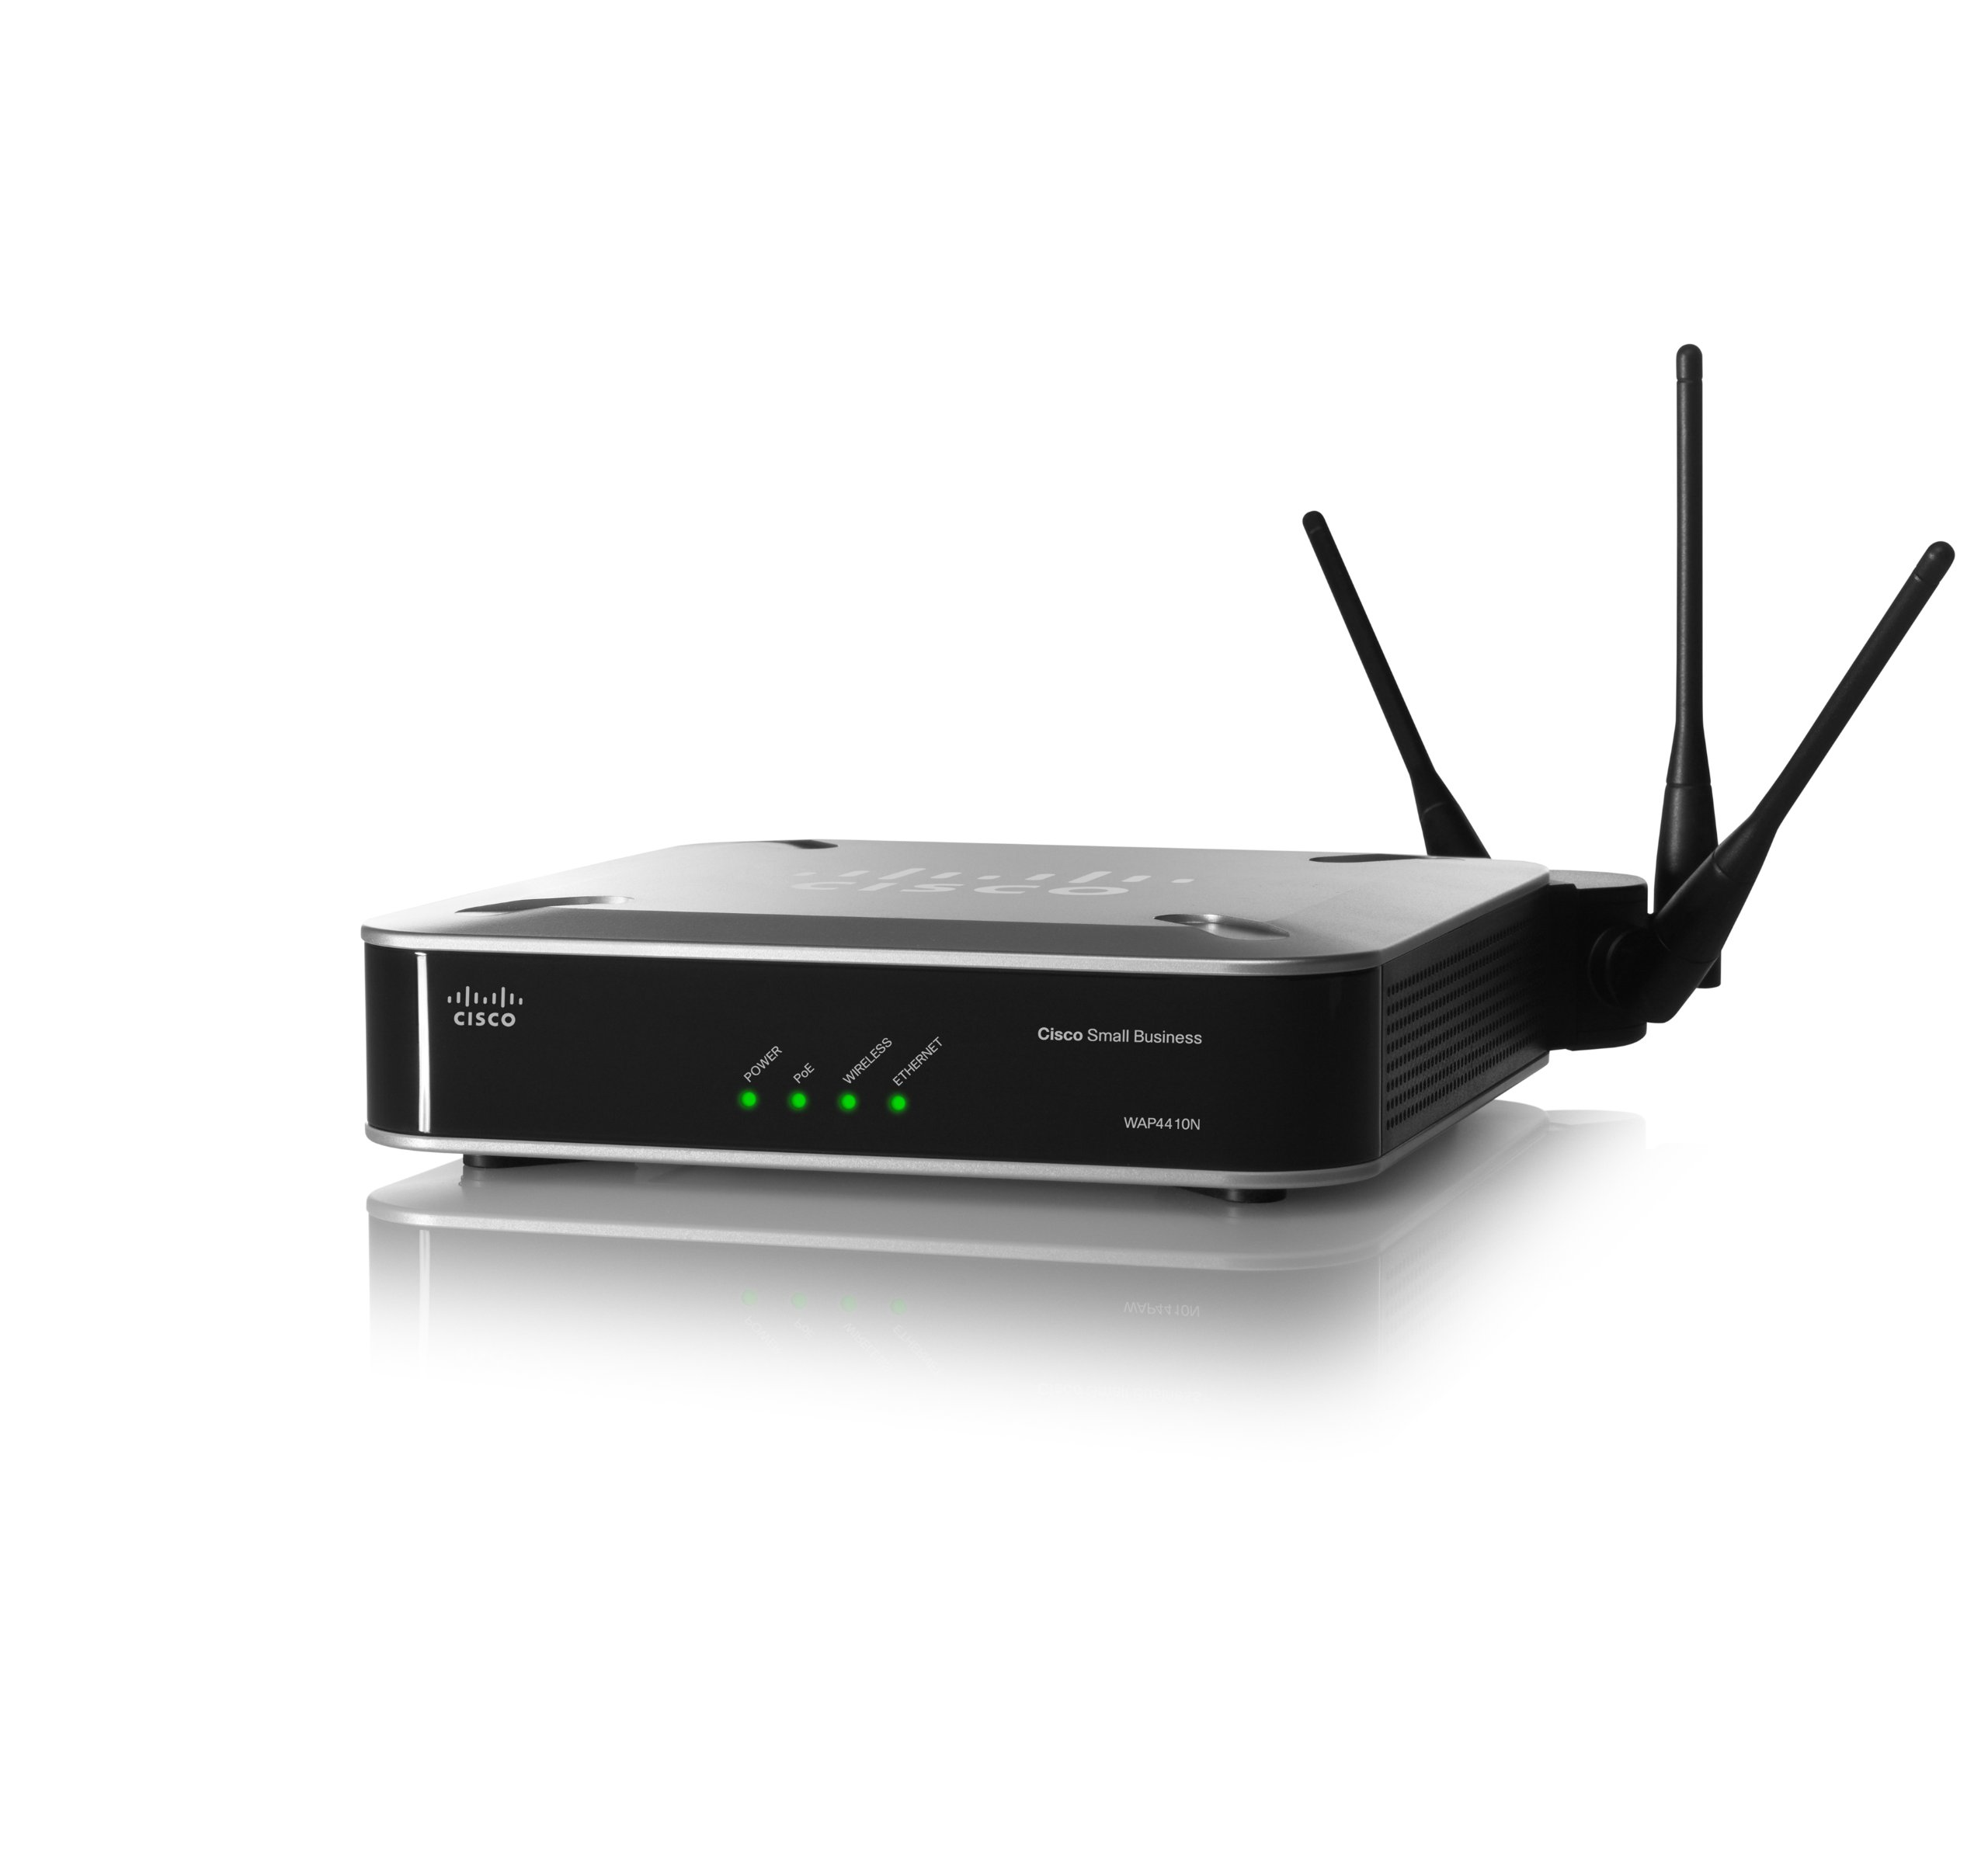 Linksys by Cisco WAP4400N Wireless-N Access Point - PoE by Linksys